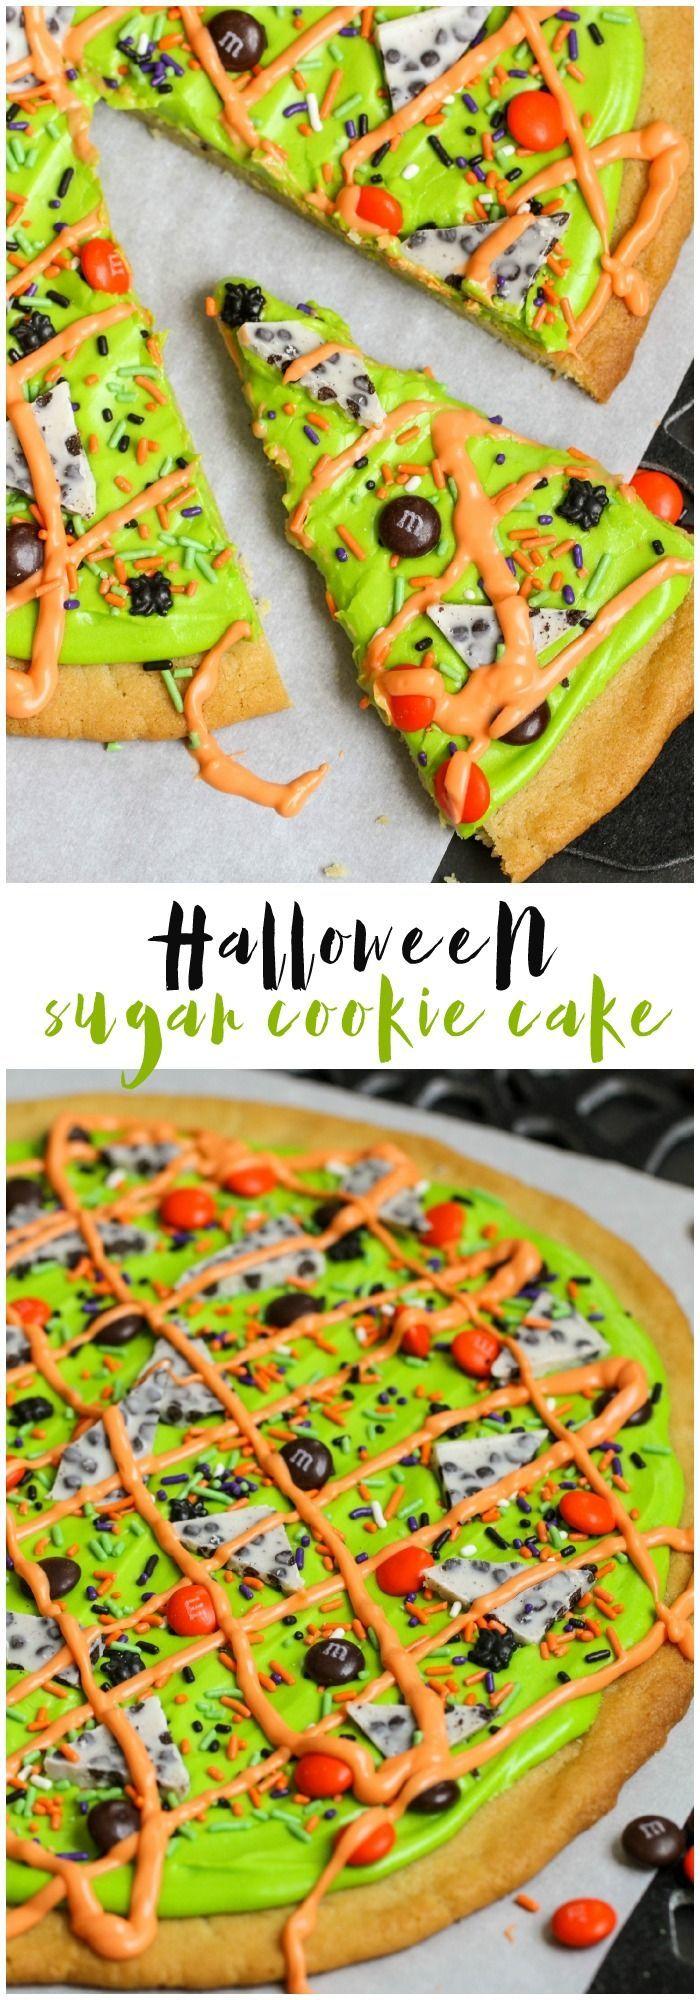 Halloween Sugar Cookie Cake